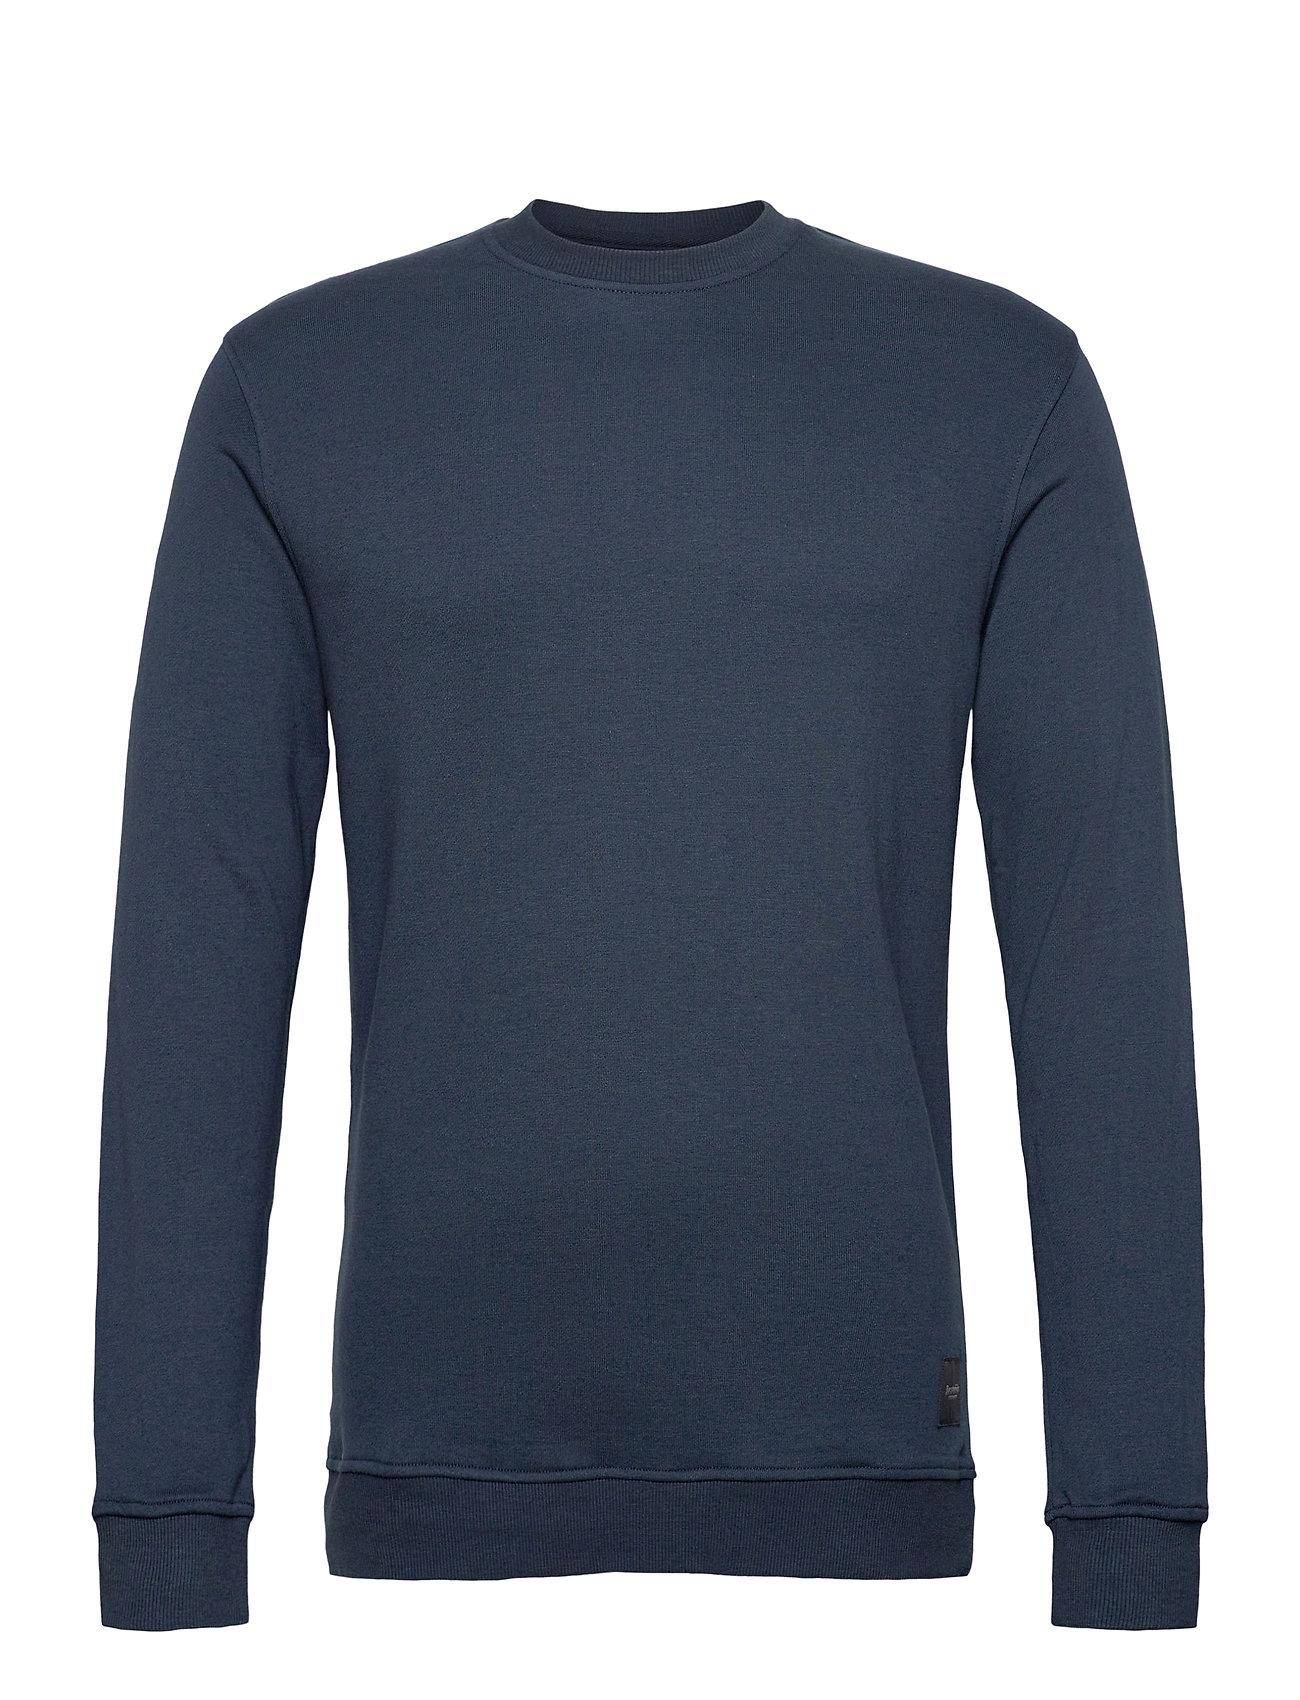 Image of Bamboo Sweatshirt Sweatshirt Trøje Blå Resteröds (3455507573)